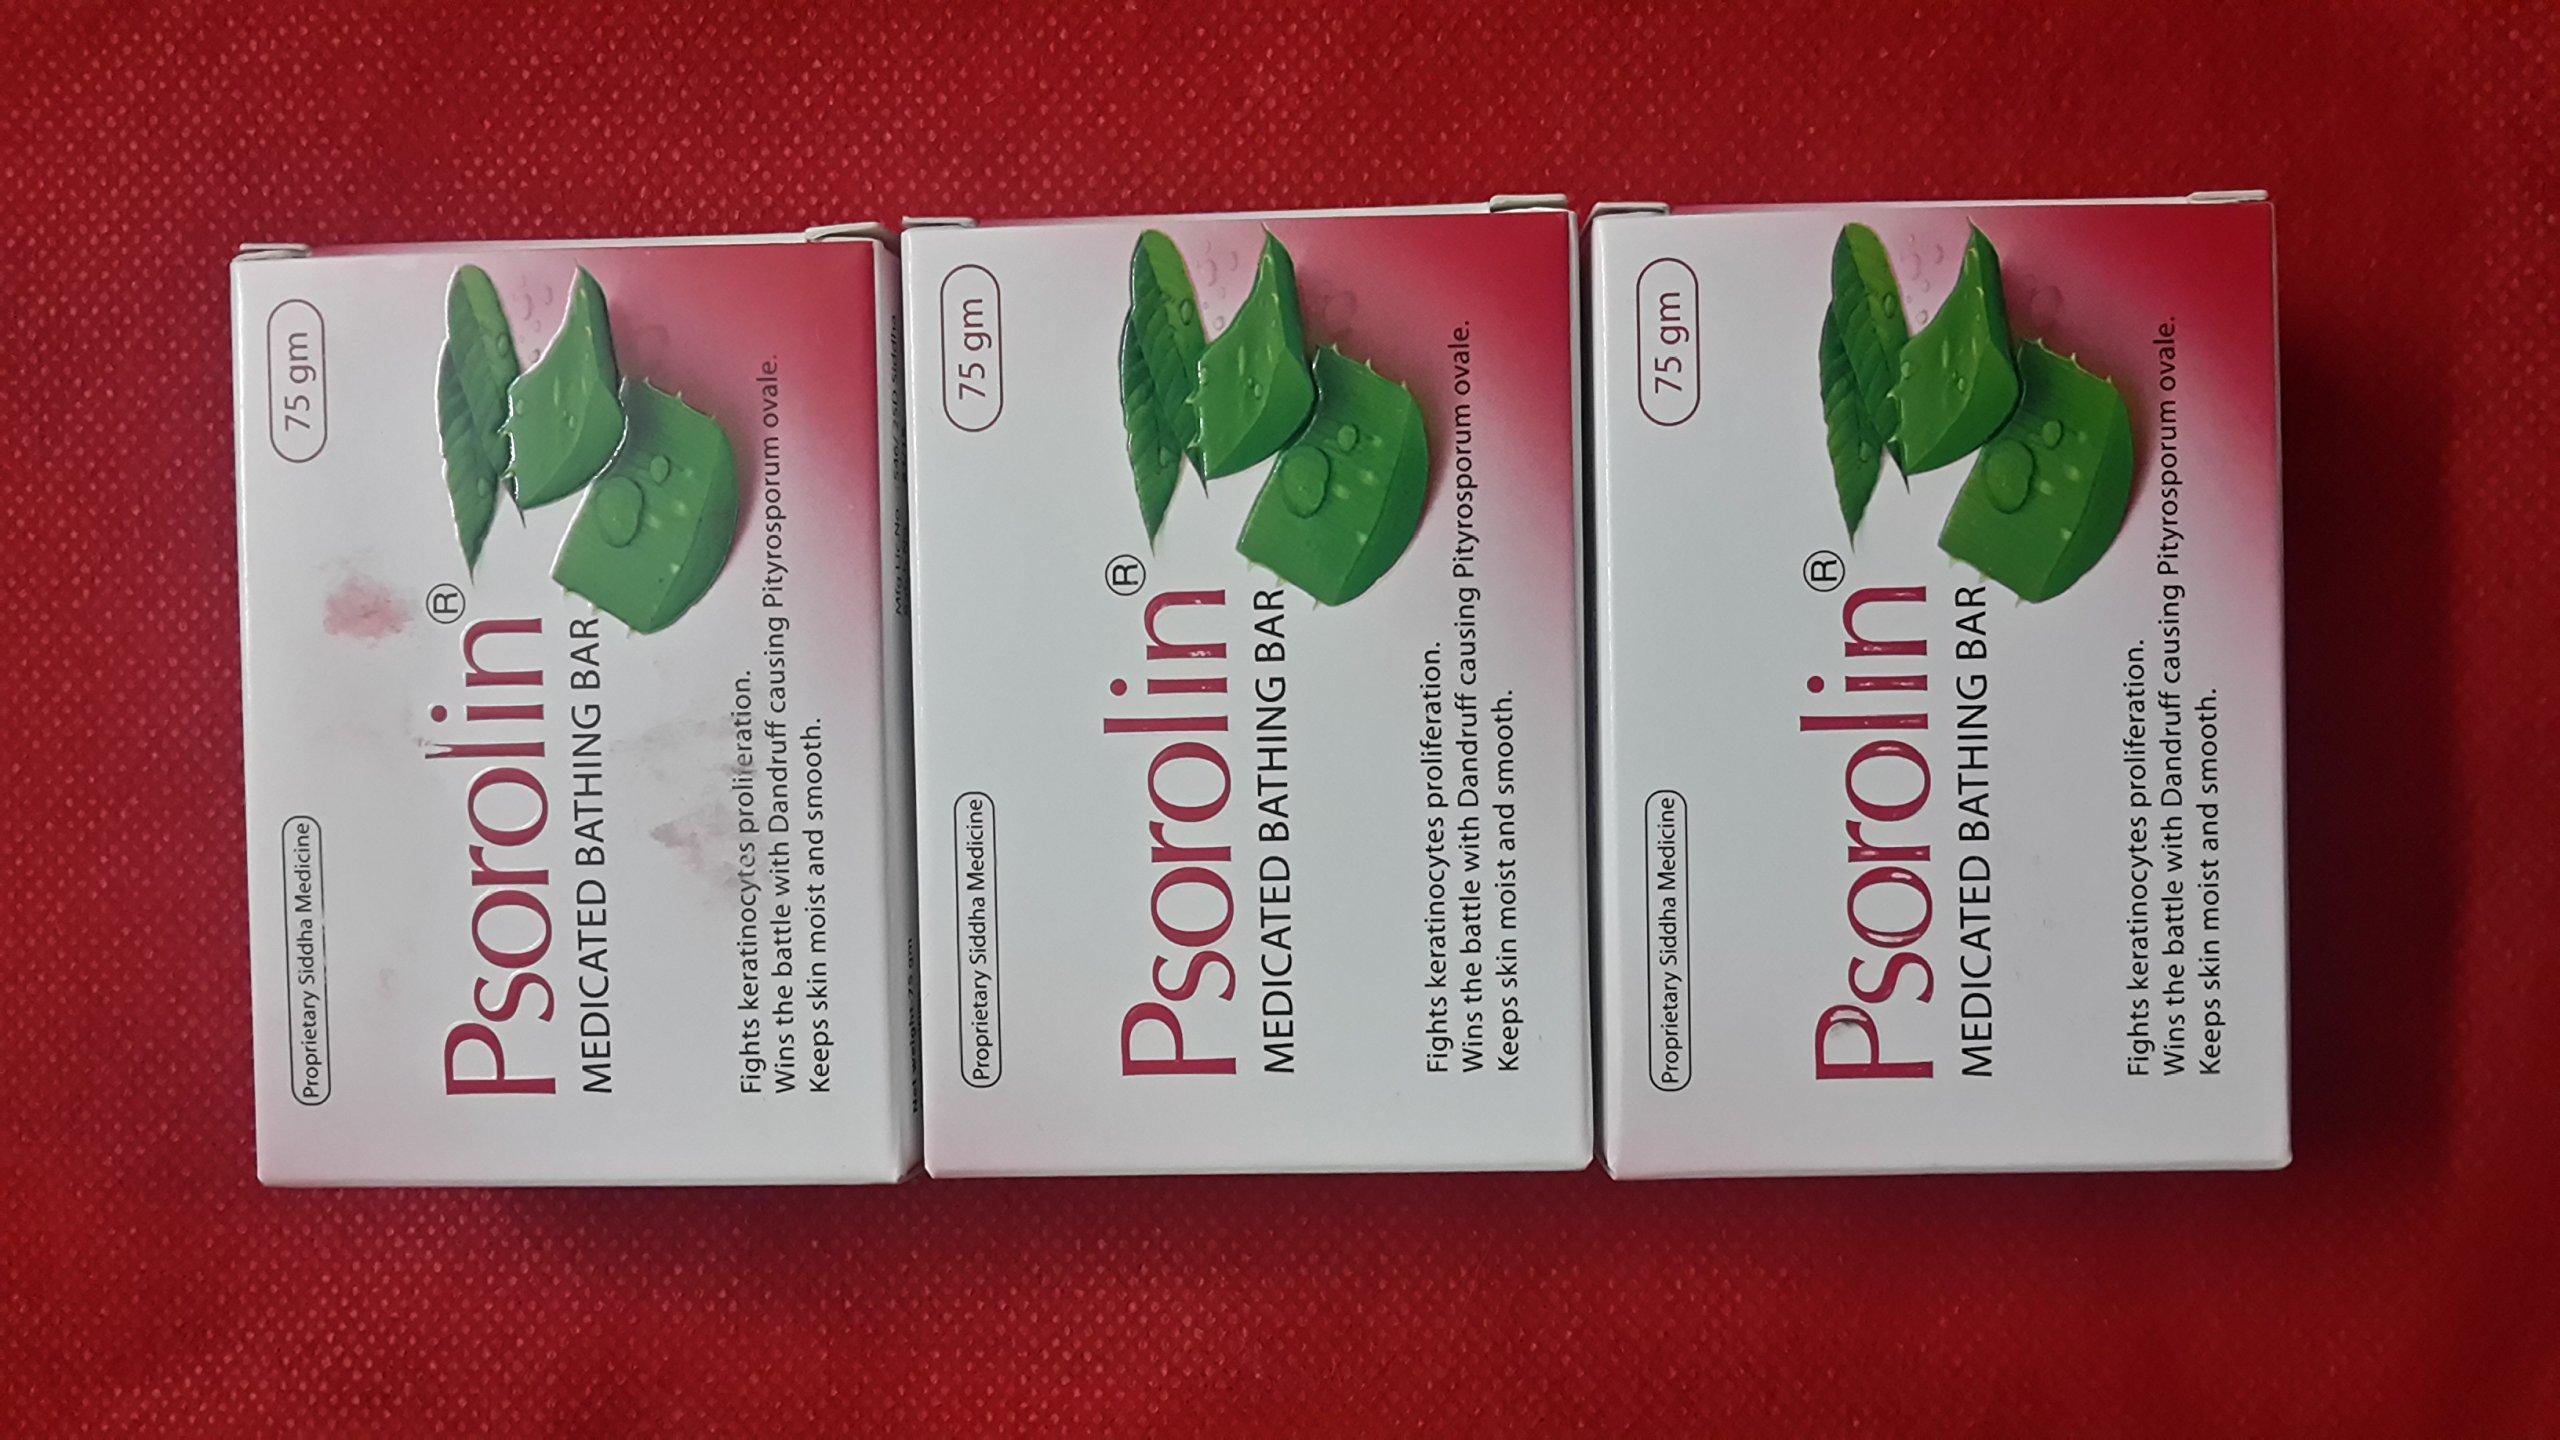 PSOROLIN Medicated Soap - 3 Pieces | for Psoriasis Vitiligo Dermatitis Eczema